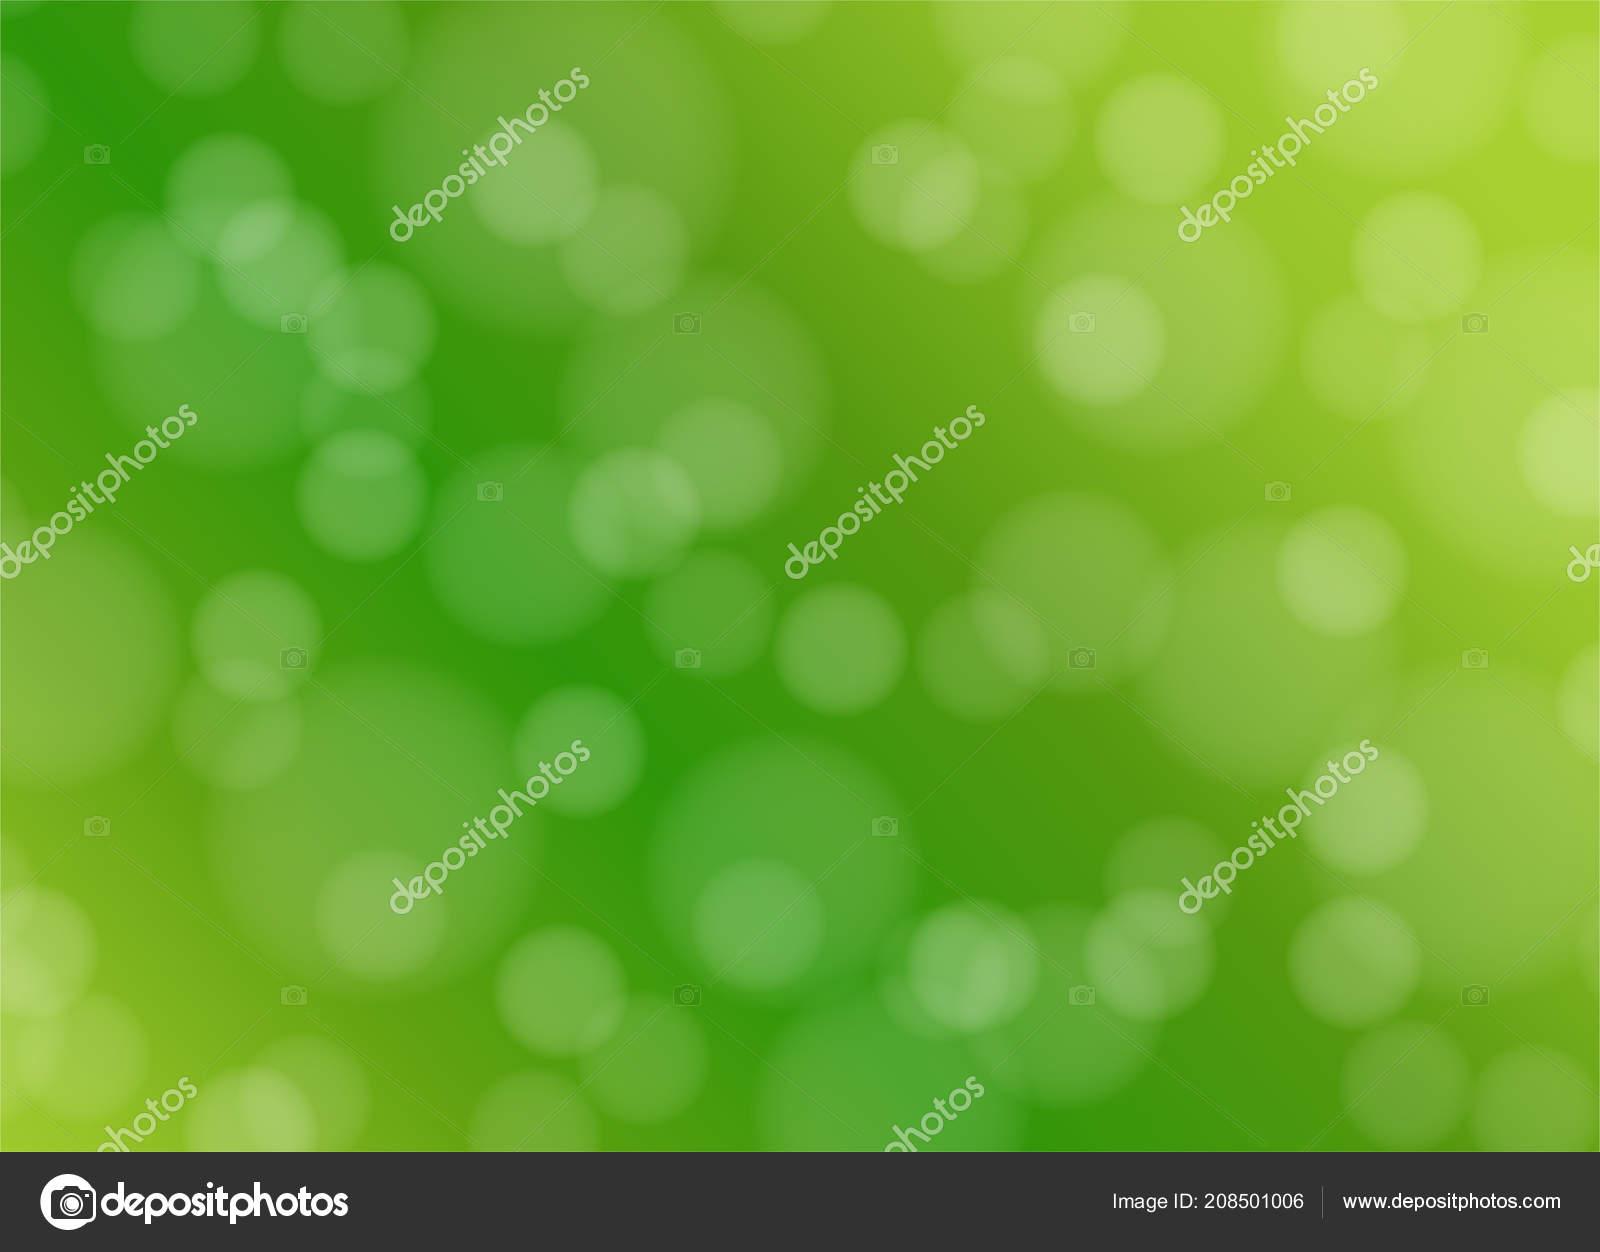 79702d37cf Depositphotos stock illustration blurred green background bokeh soft jpg  1600x1252 Soft light green